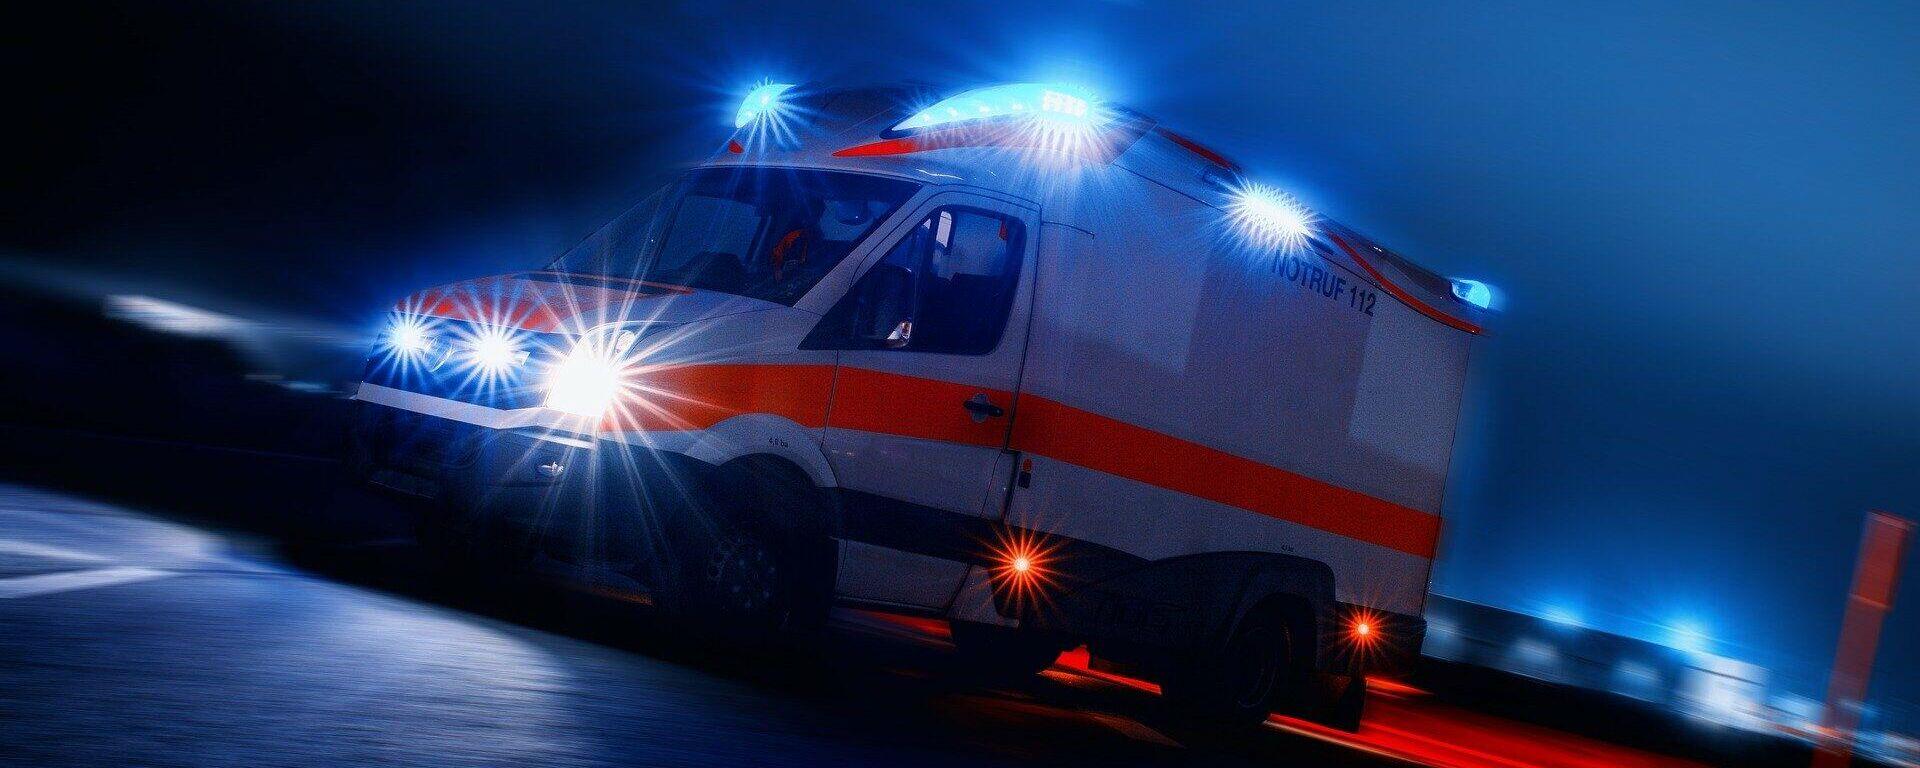 Krankenwagen (symbolbild) - SNA, 1920, 08.07.2021